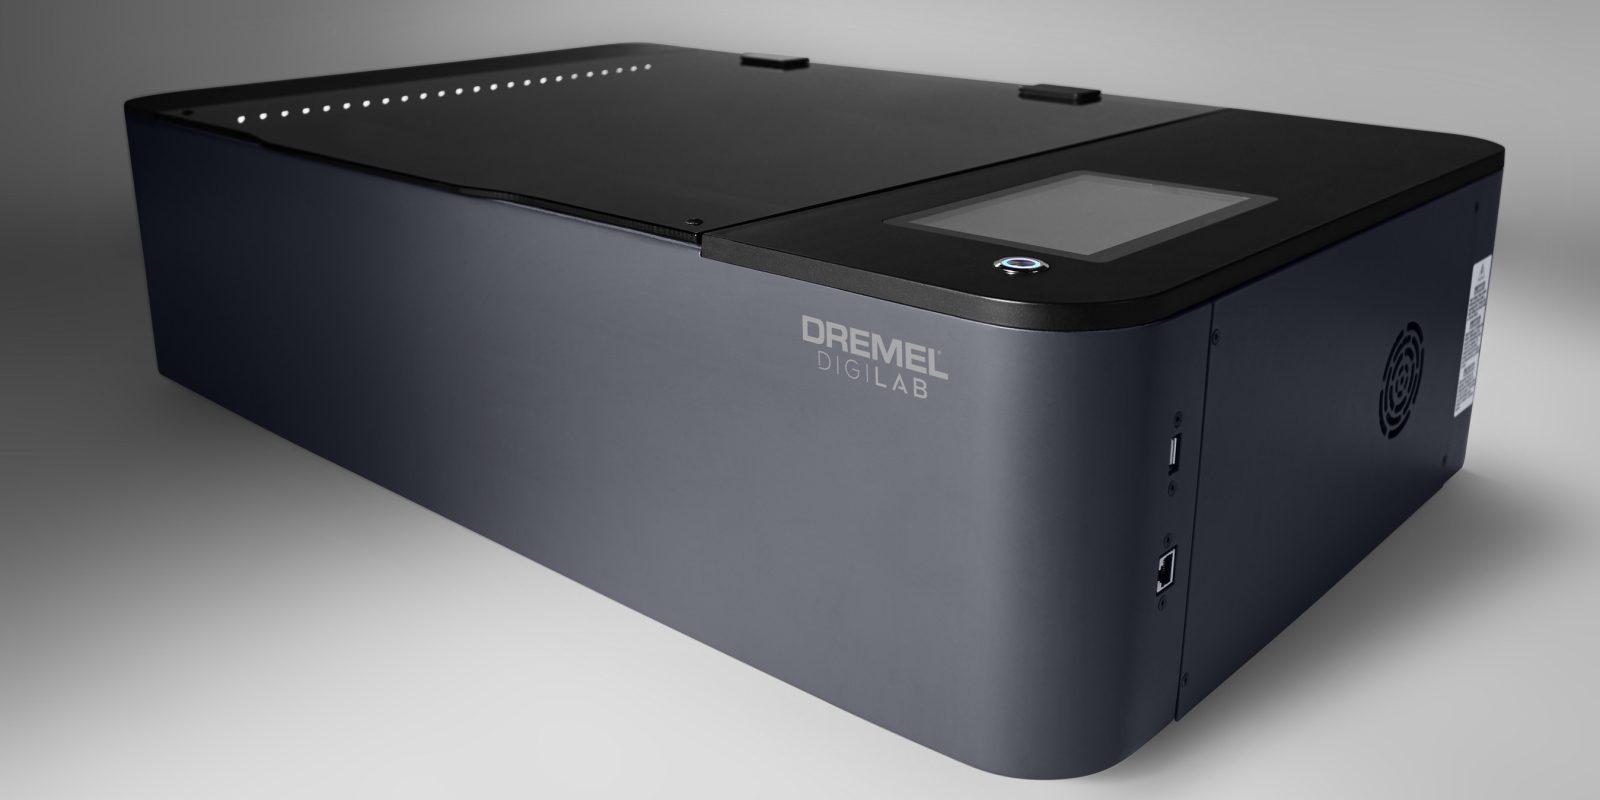 Dremel Showcases New Digilab Laser Cutter That Brings